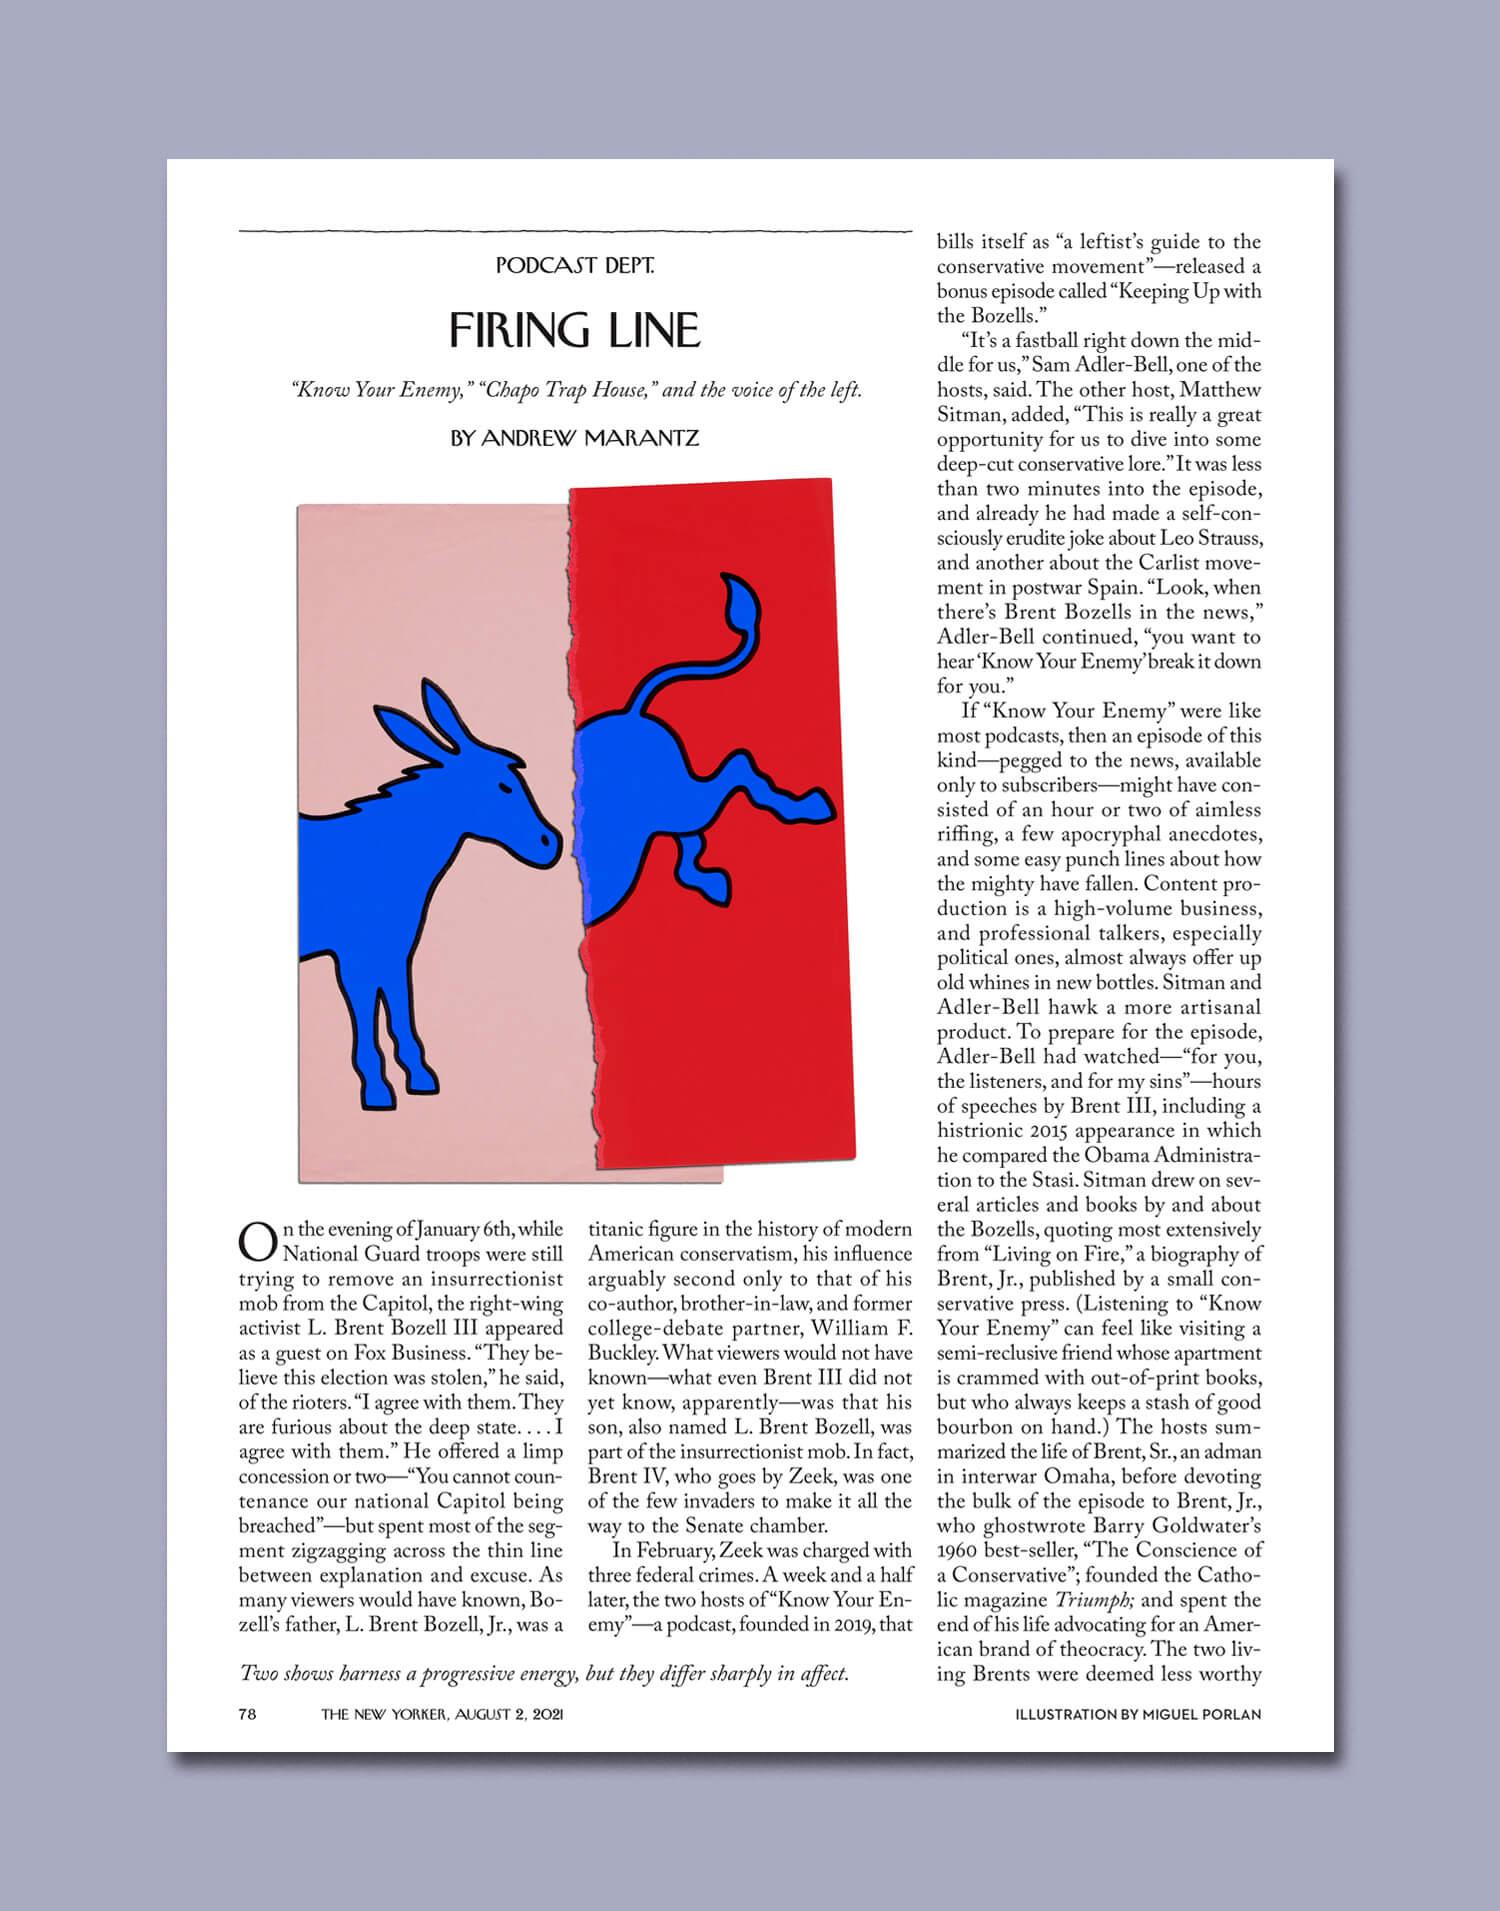 miguel-porlan-illustration-the-new-yorker-firing-line-2